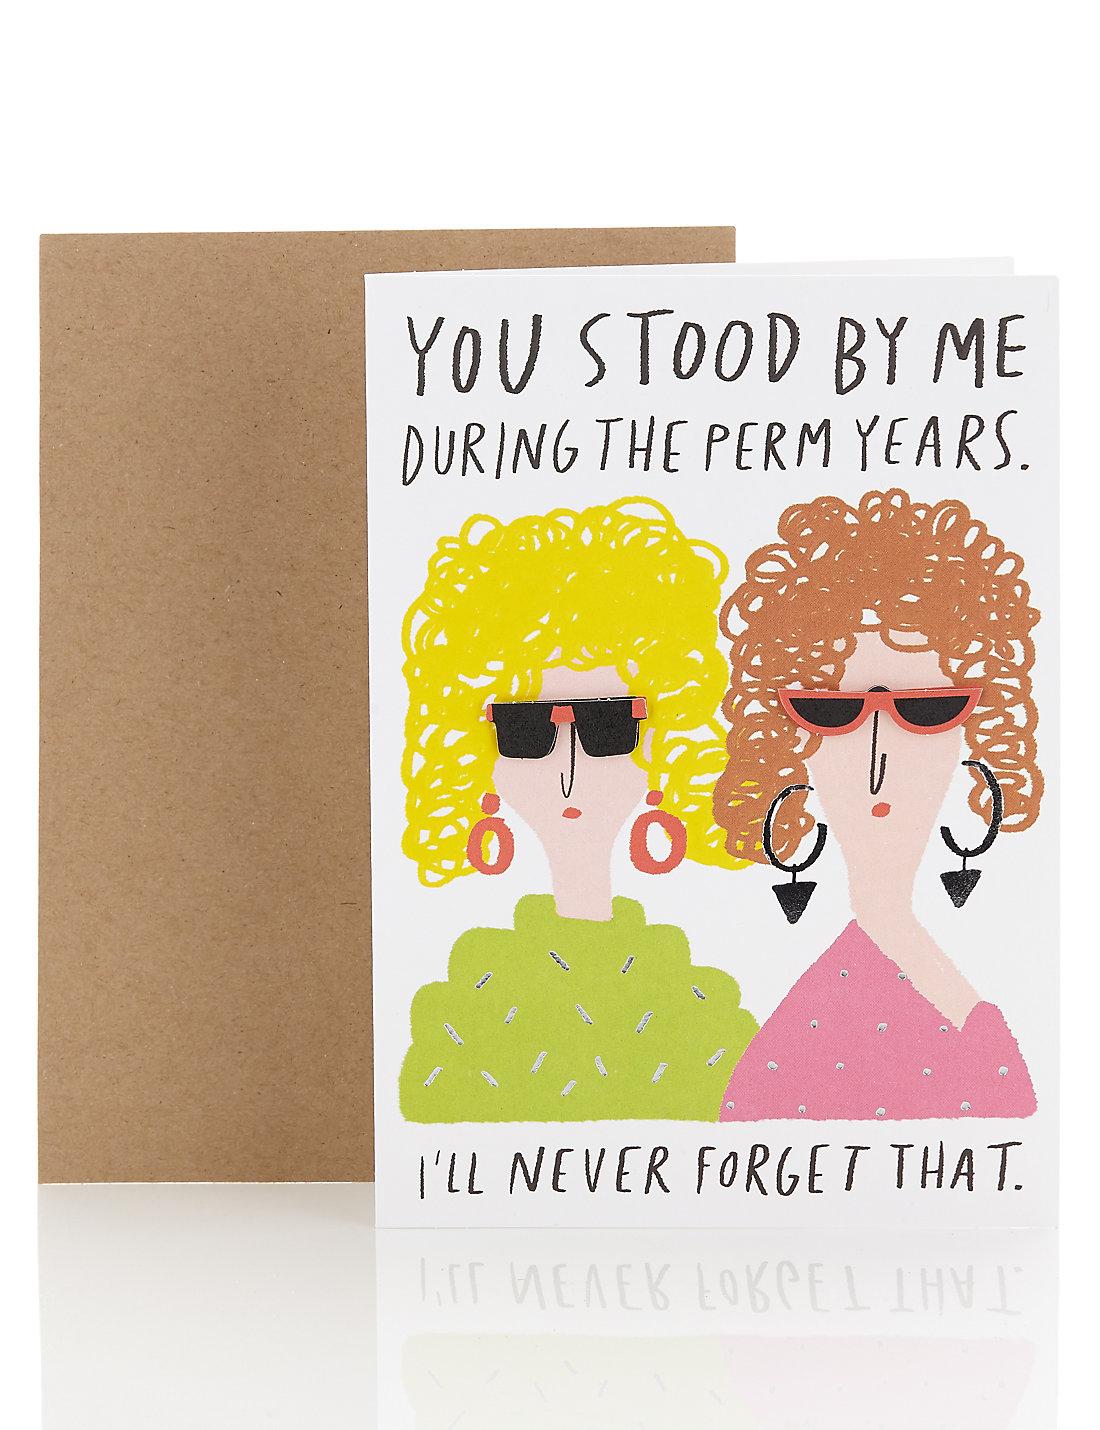 Perm Years Humour Birthday Card – Birthday Cards Humour